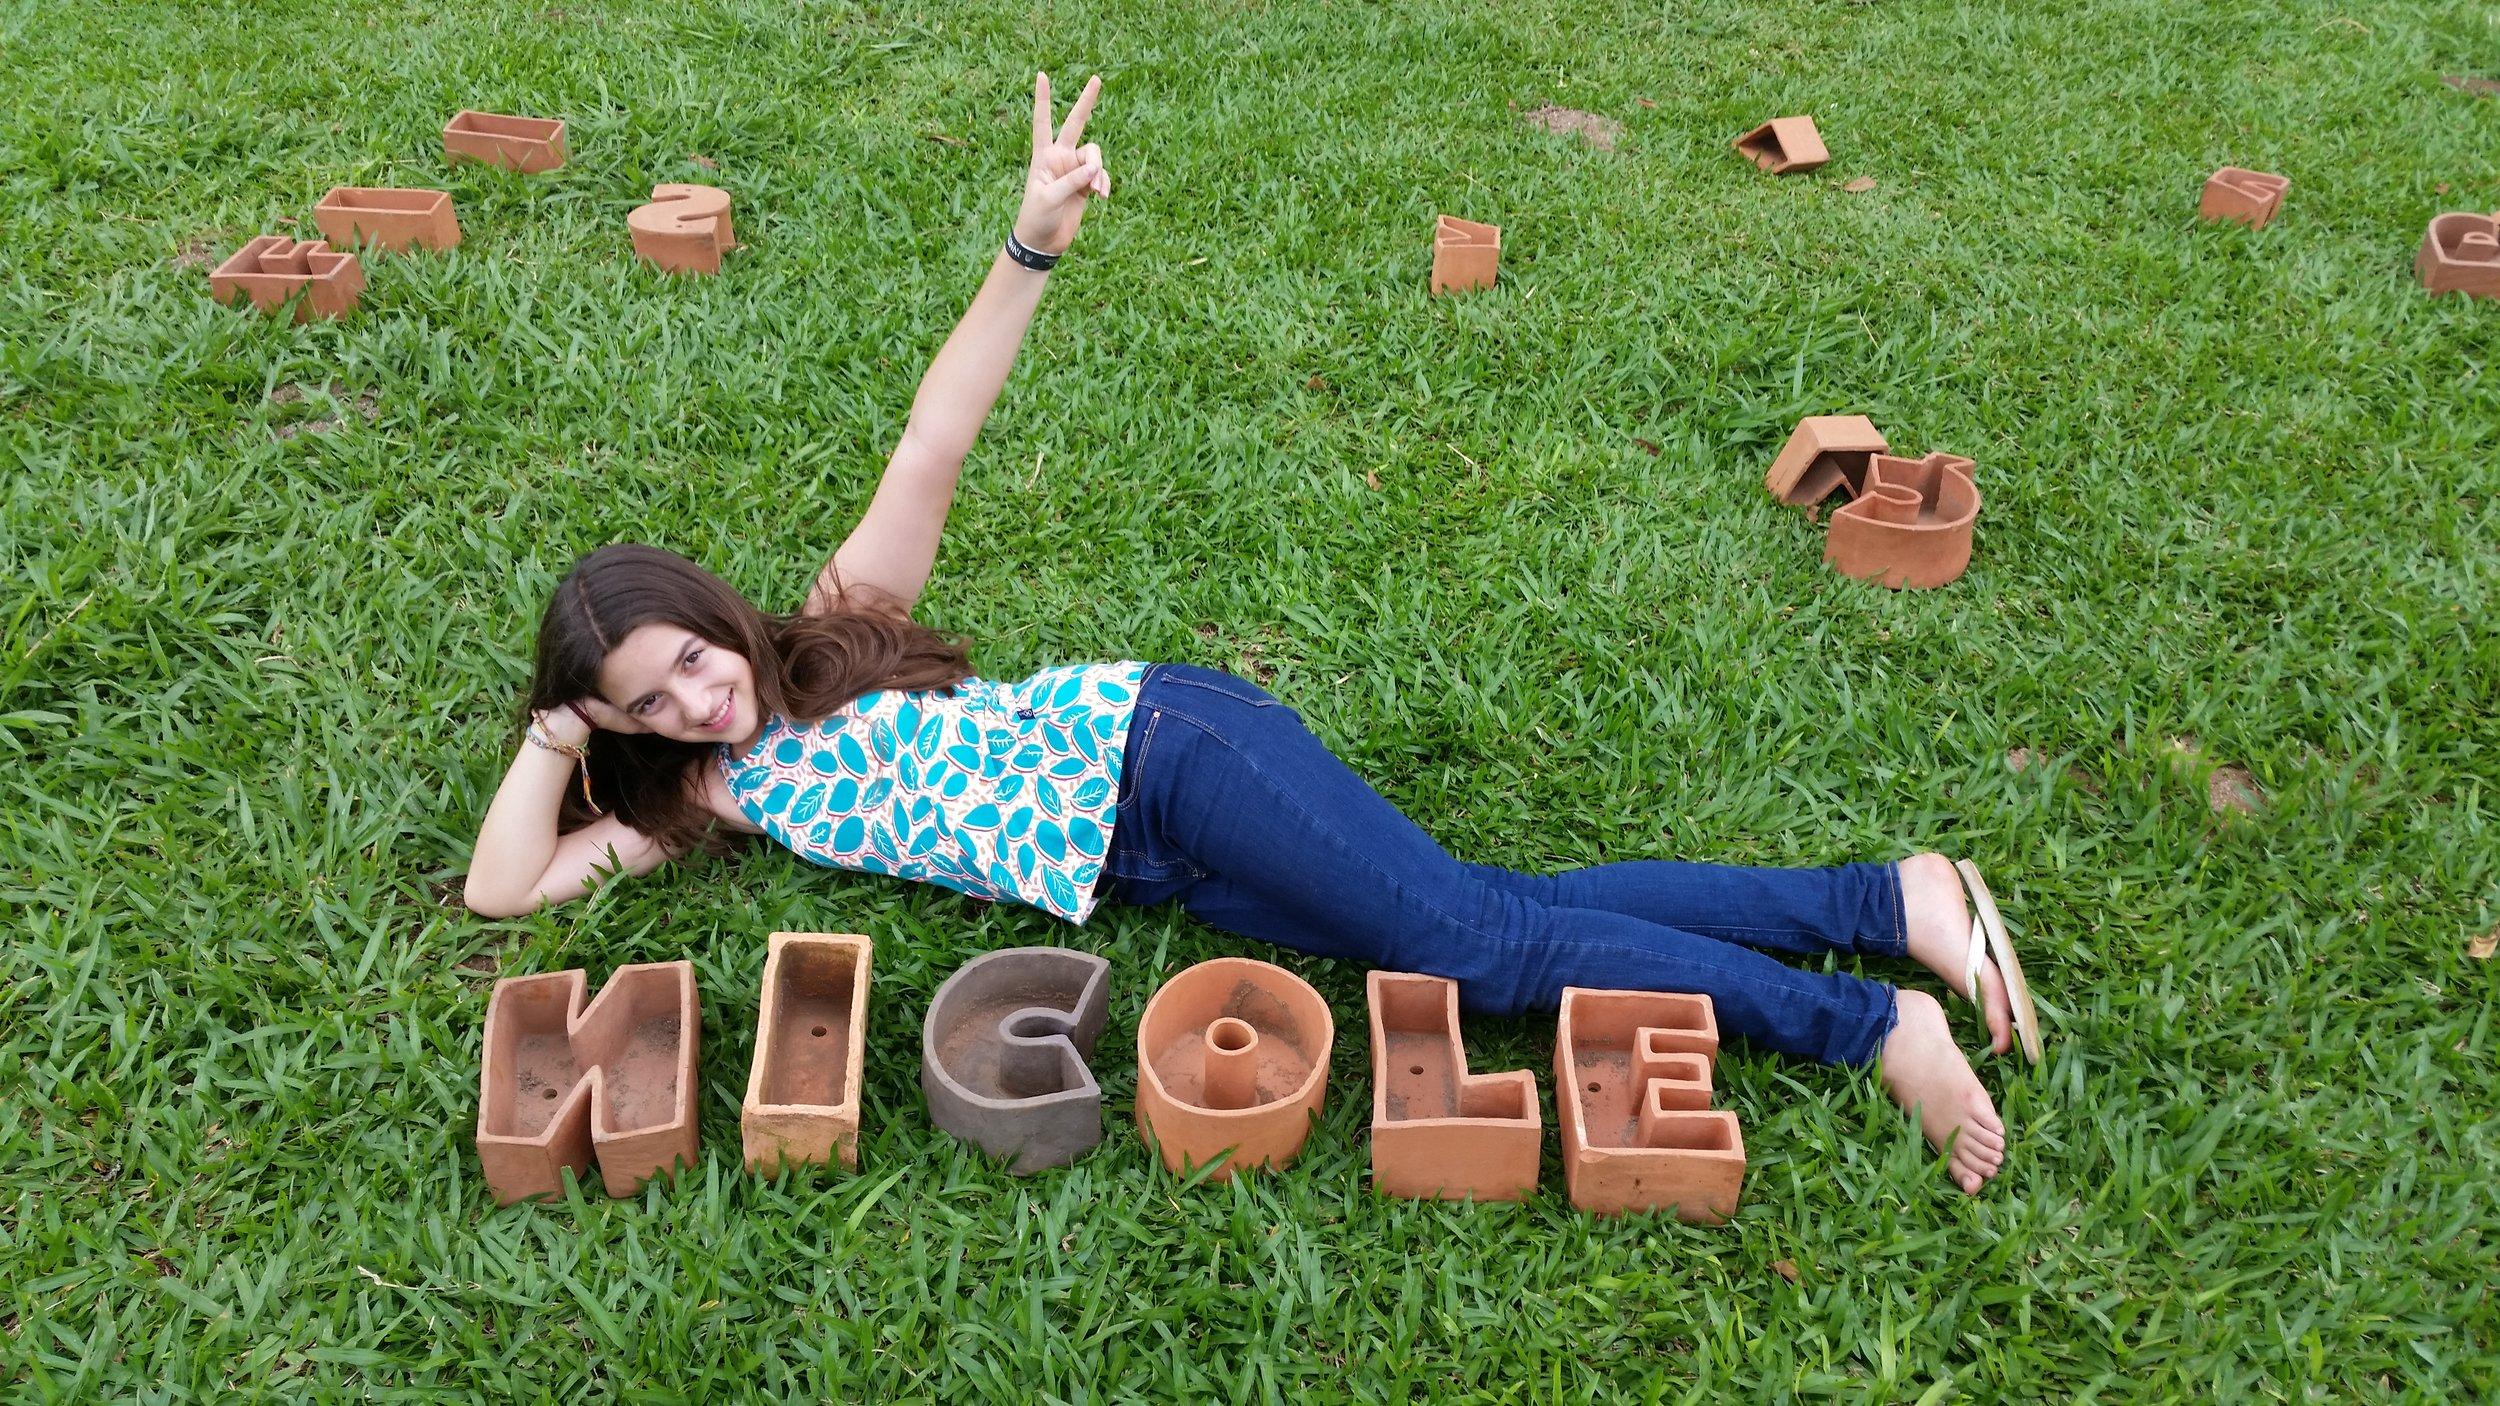 Nicole - 006.jpg